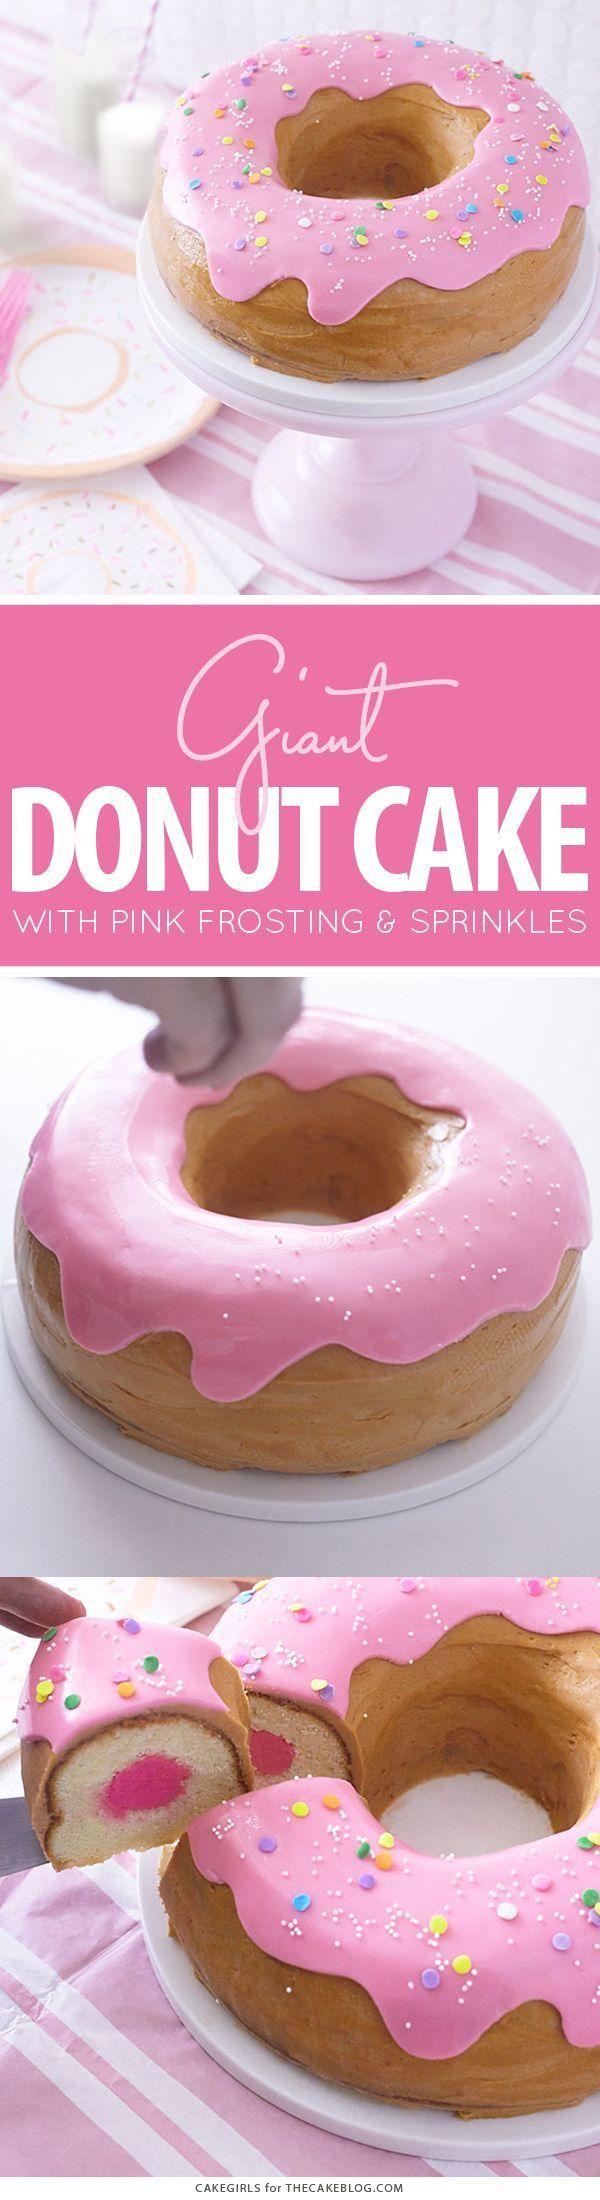 Giant Donut Cake